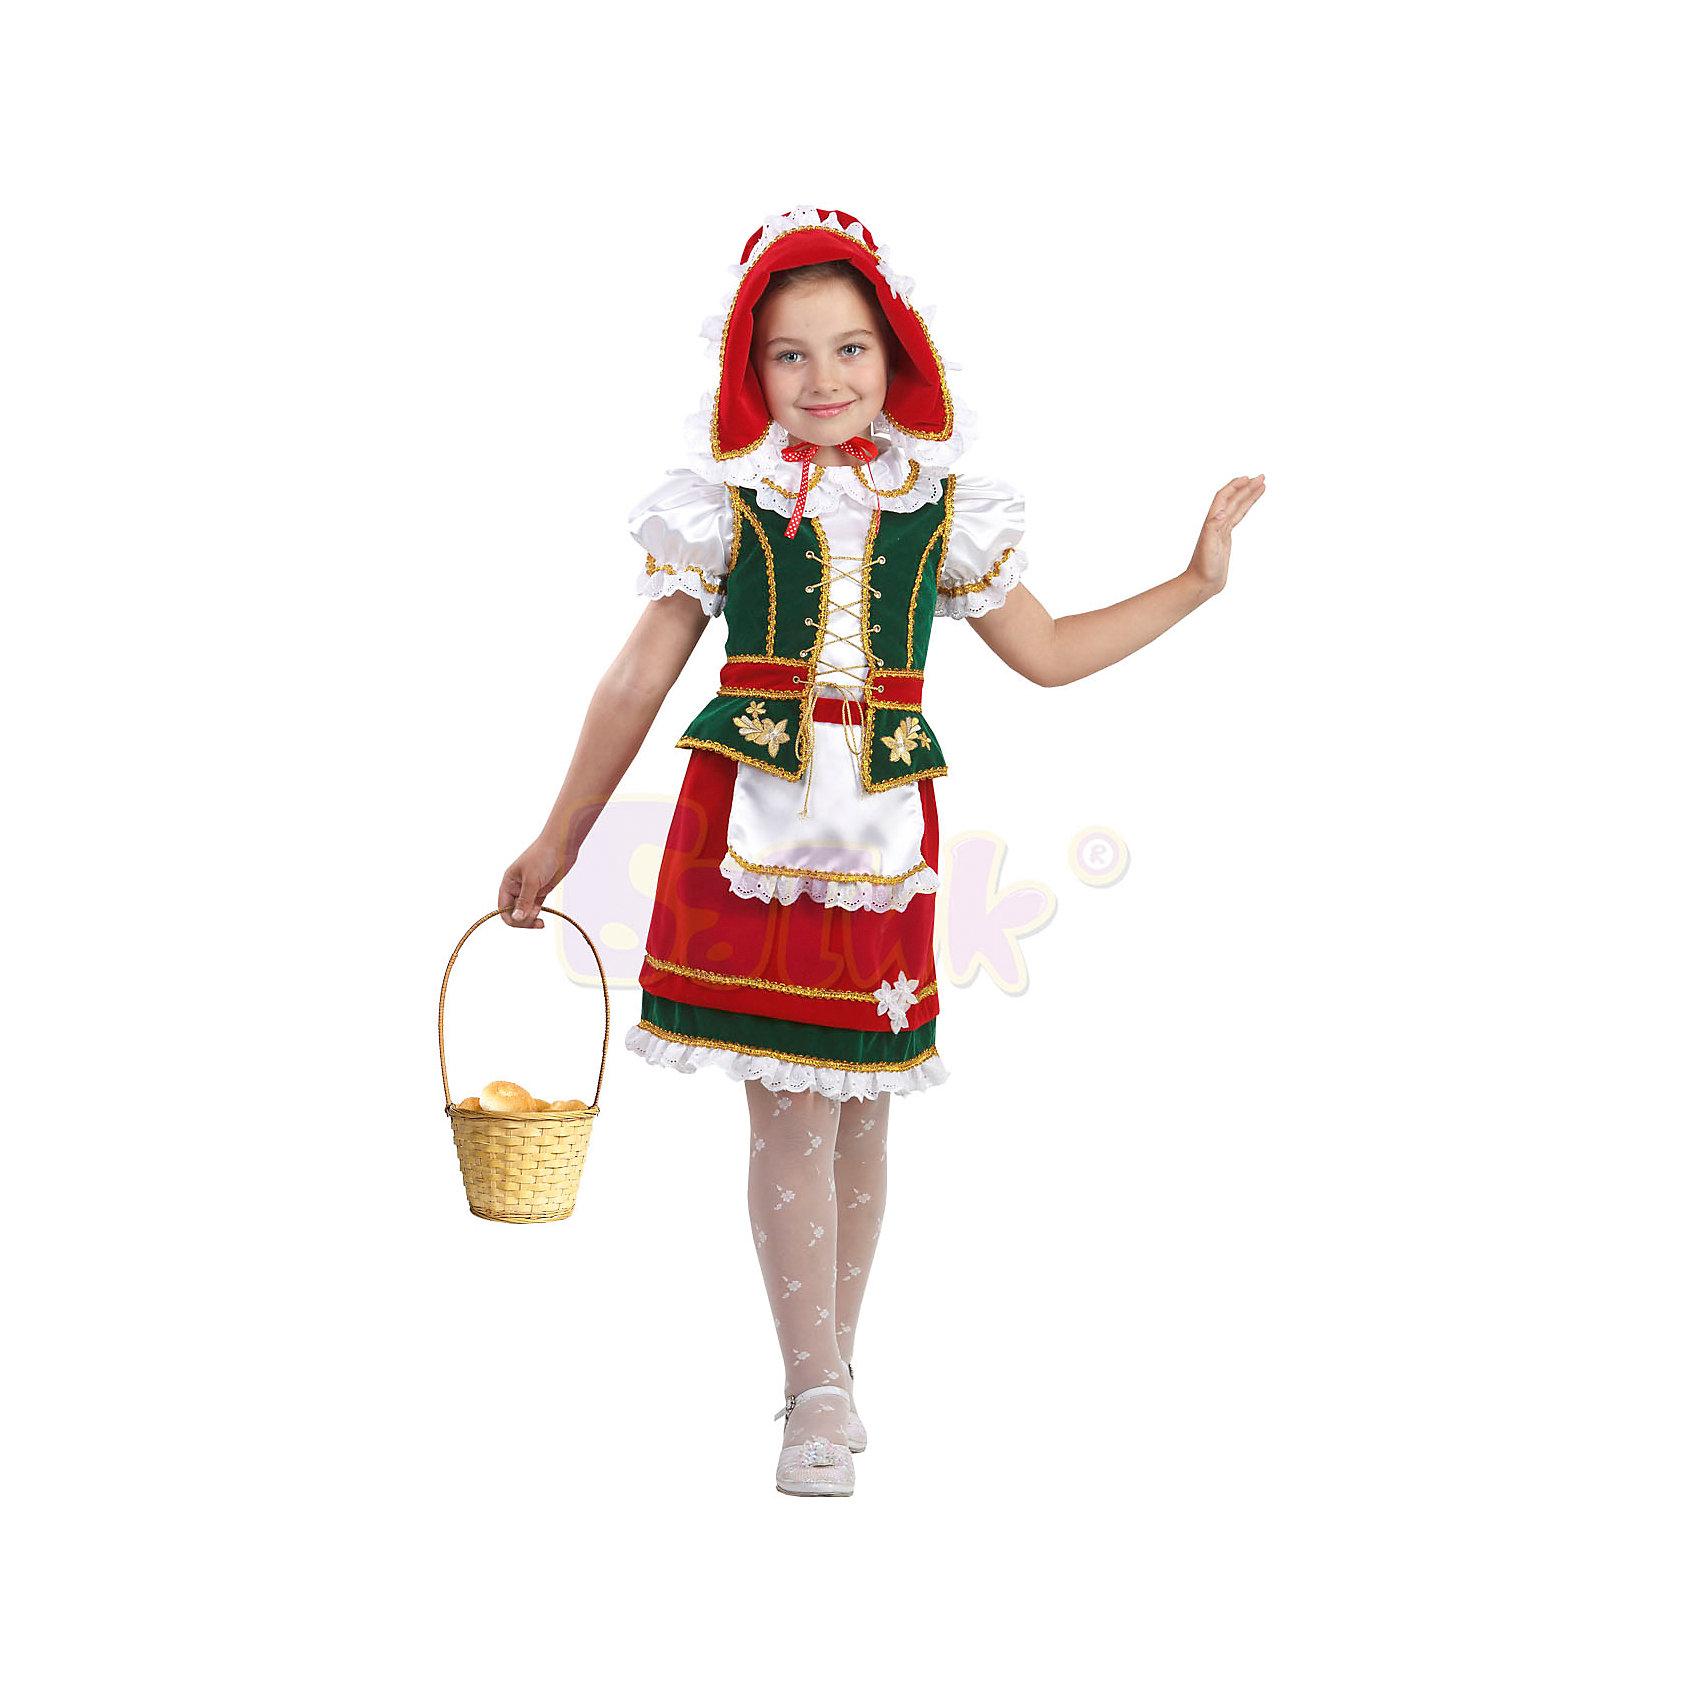 Батик Карнавальный костюм Красная шапочка Звездный маскарад, Батик